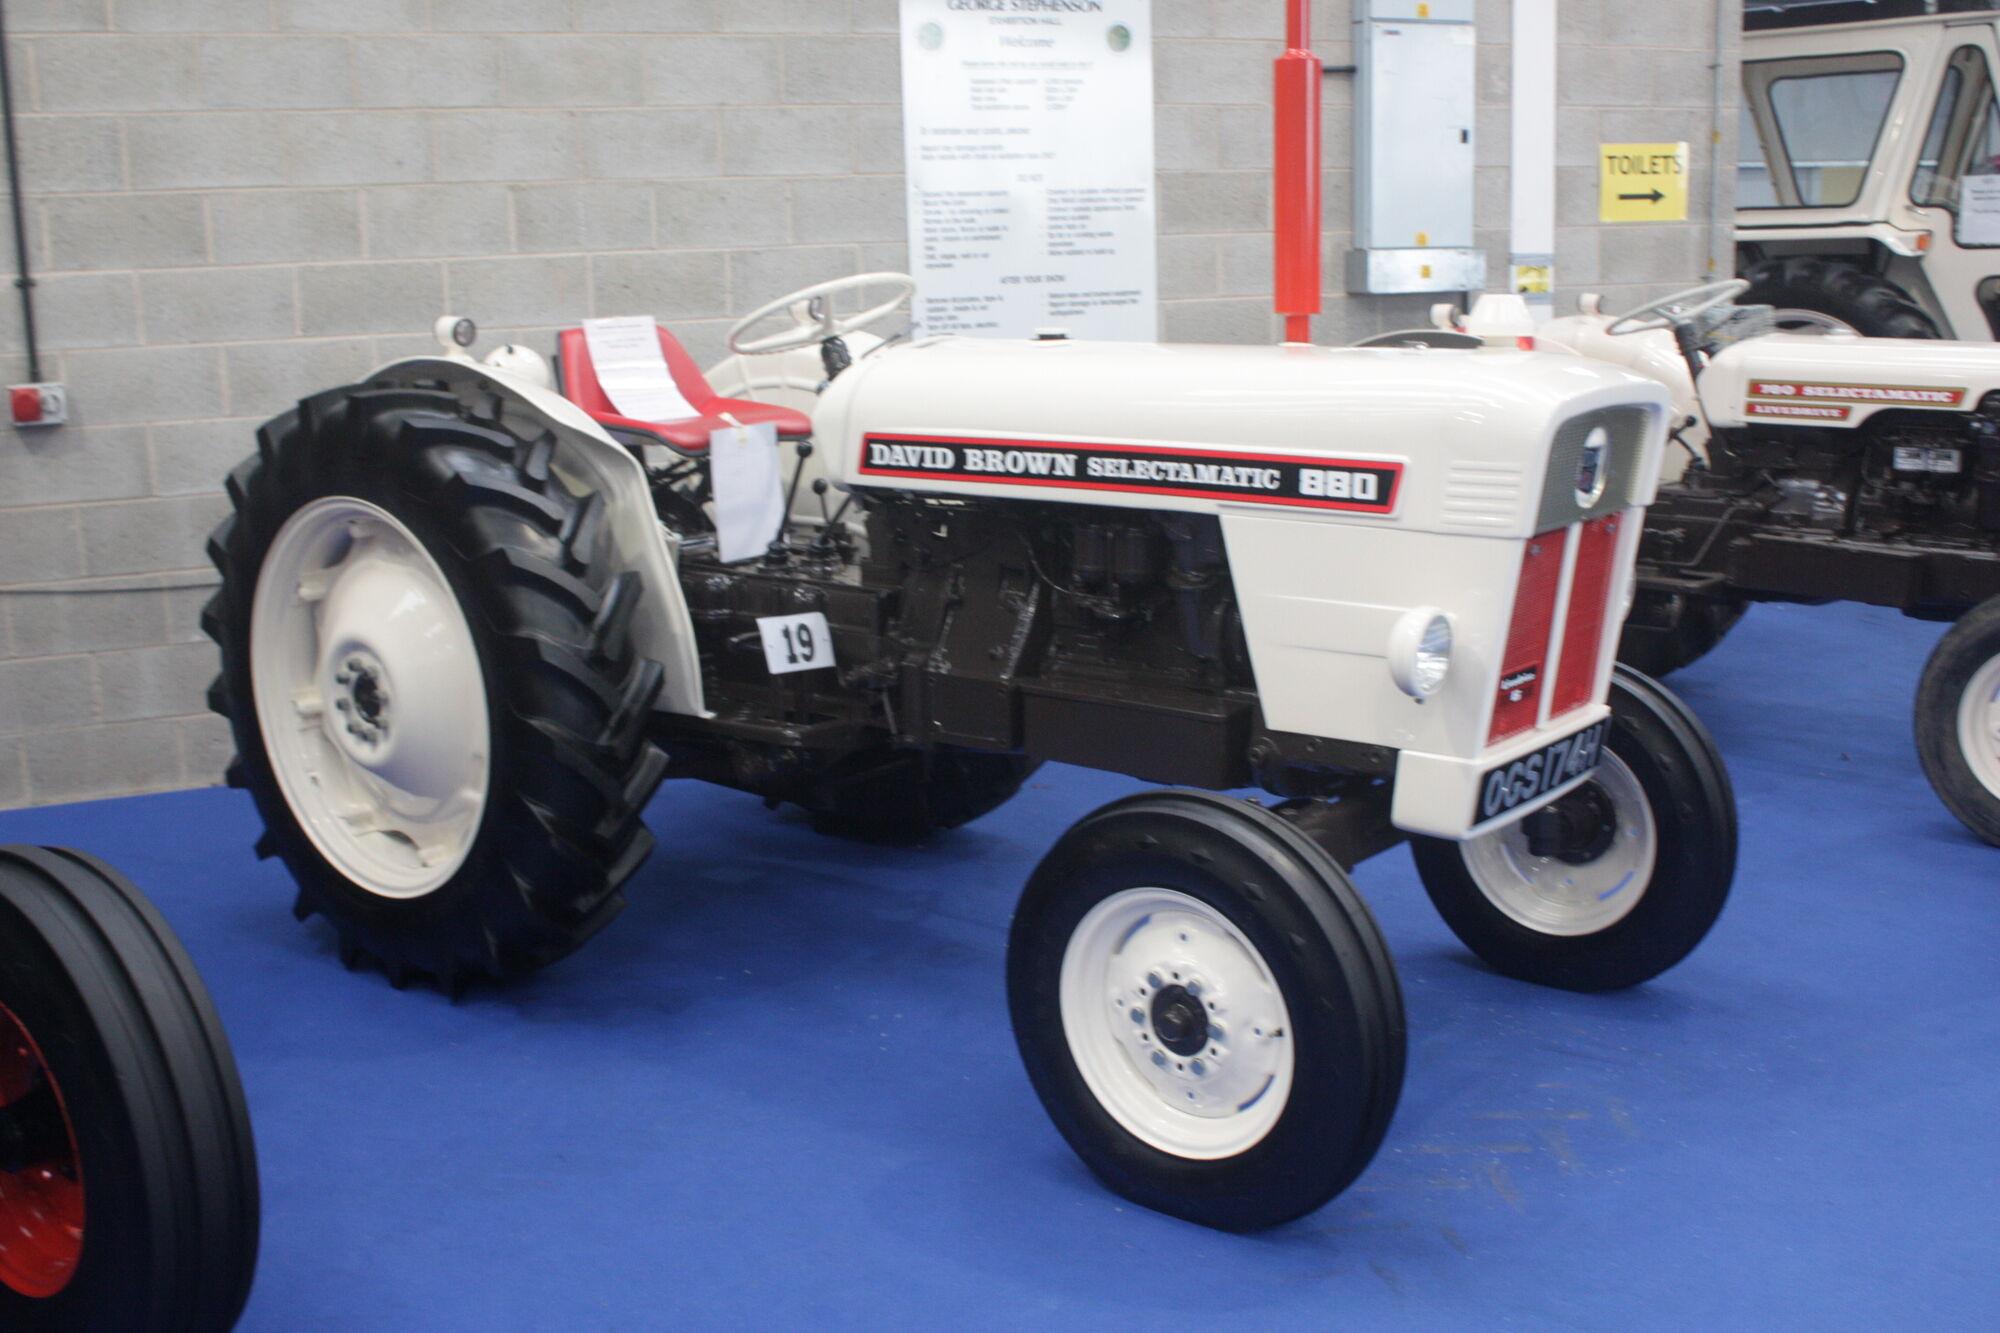 david brown 880 selectamatic tractor construction plant wiki rh tractors wikia com David Brown Tractor Models David Brown Tractor Models